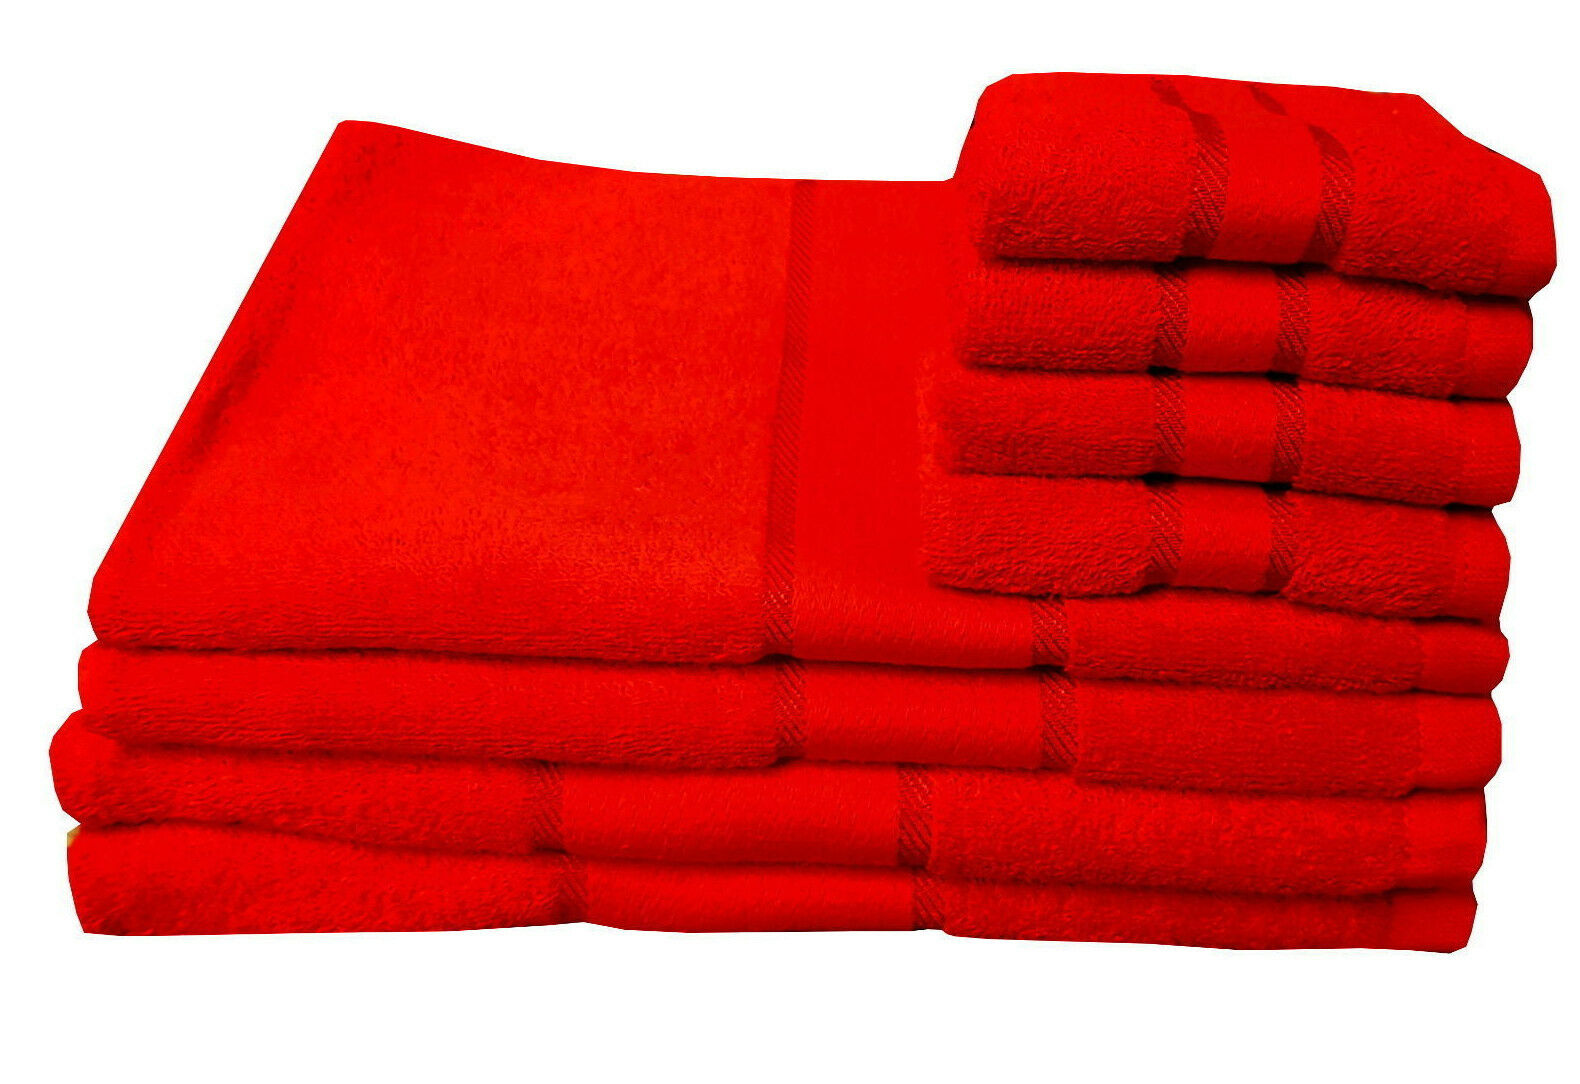 Rot 400 GSM Handtücher Aus Ägyptischer Baumwolle Luxus Gekämmt Gast Hand Bade | Exquisite (in) Verarbeitung